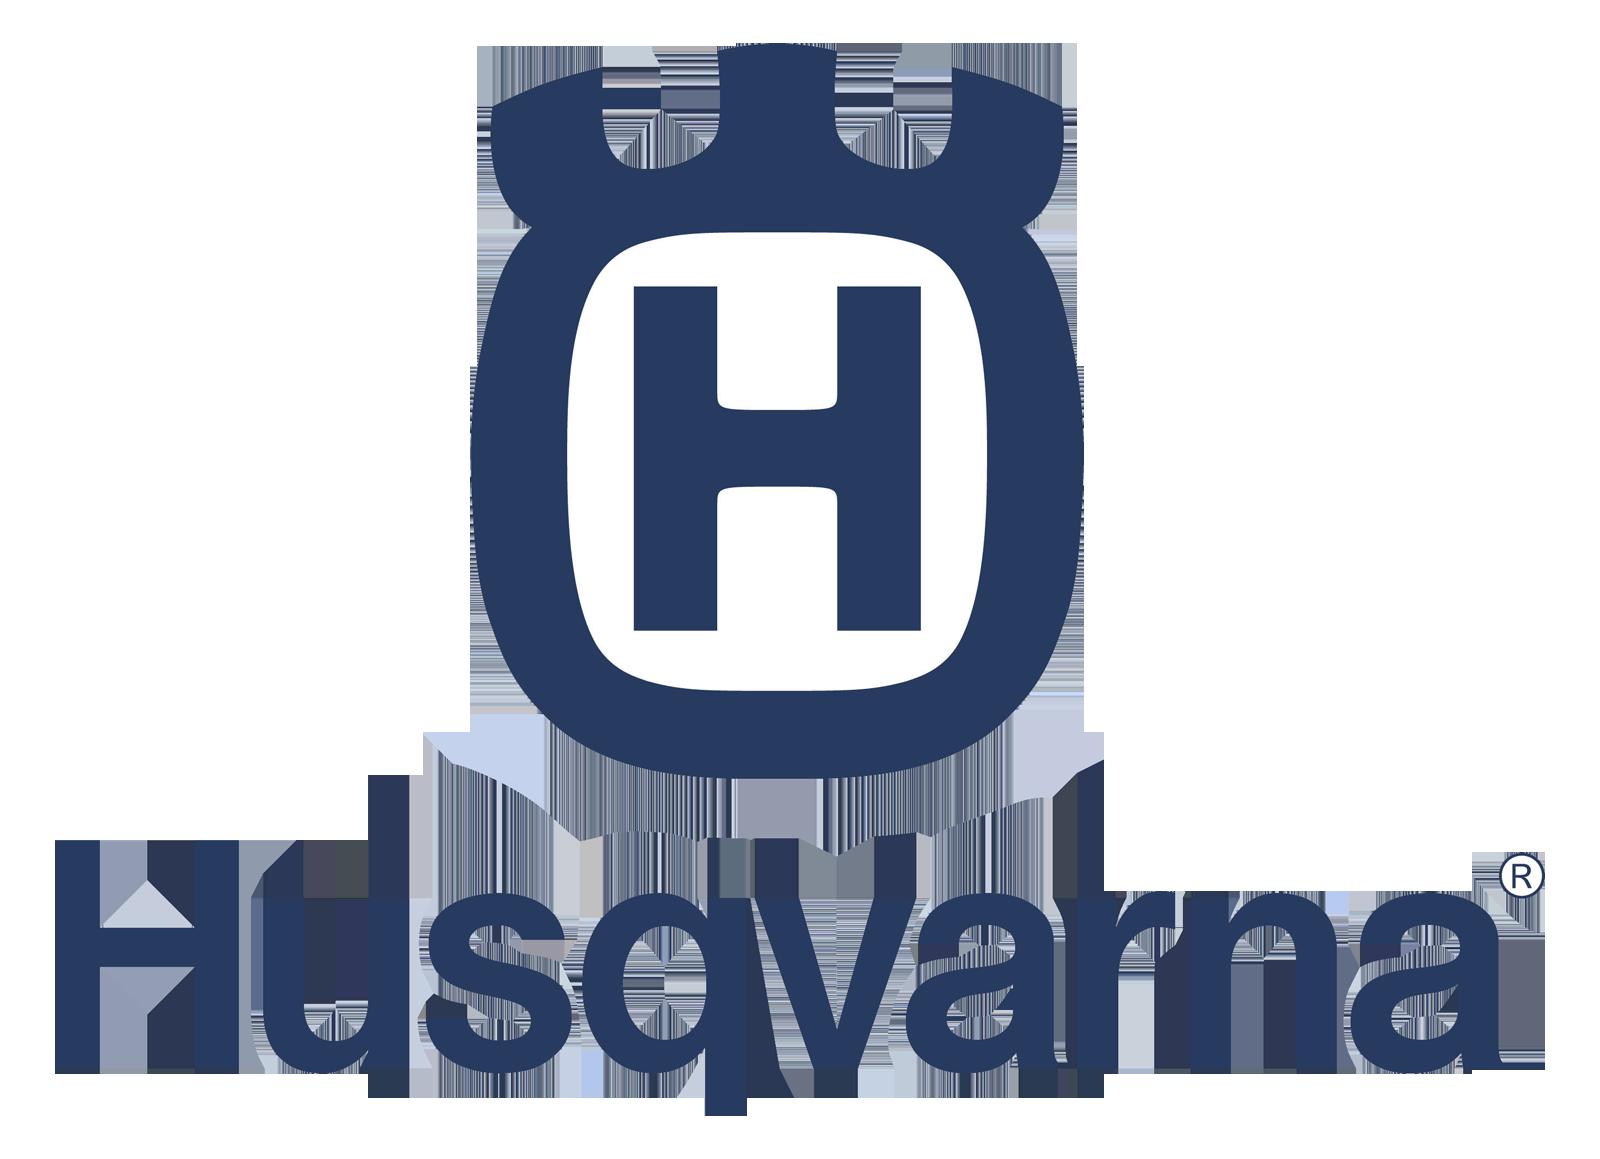 le logo moto husqvarna embleme sigle lancia. Black Bedroom Furniture Sets. Home Design Ideas